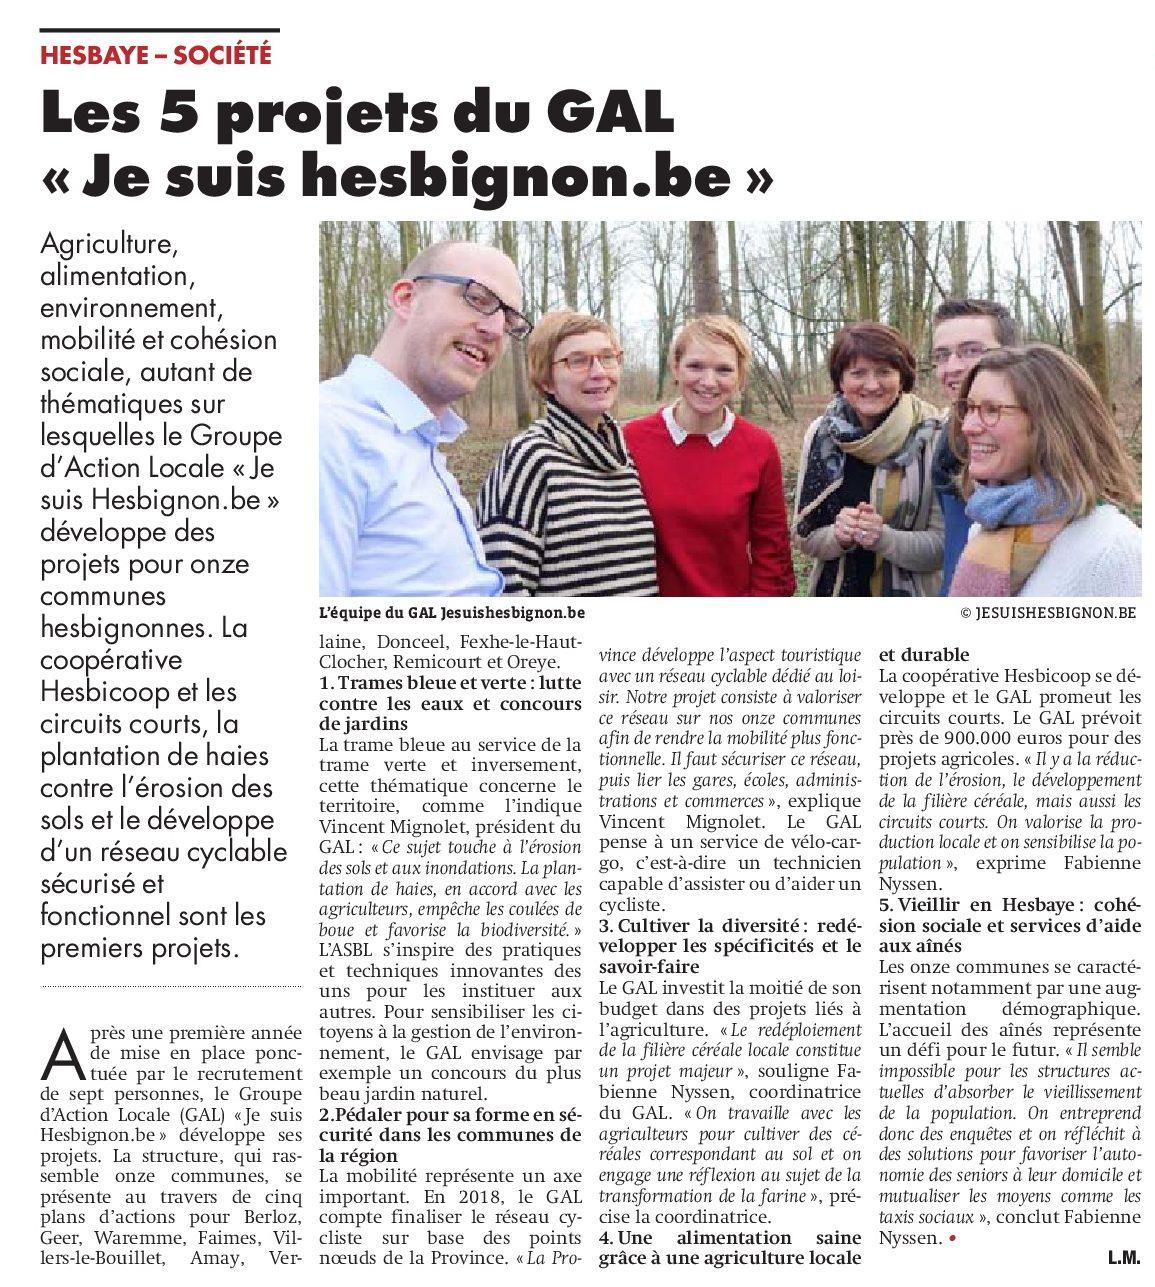 Les projets du GAL – Vlan